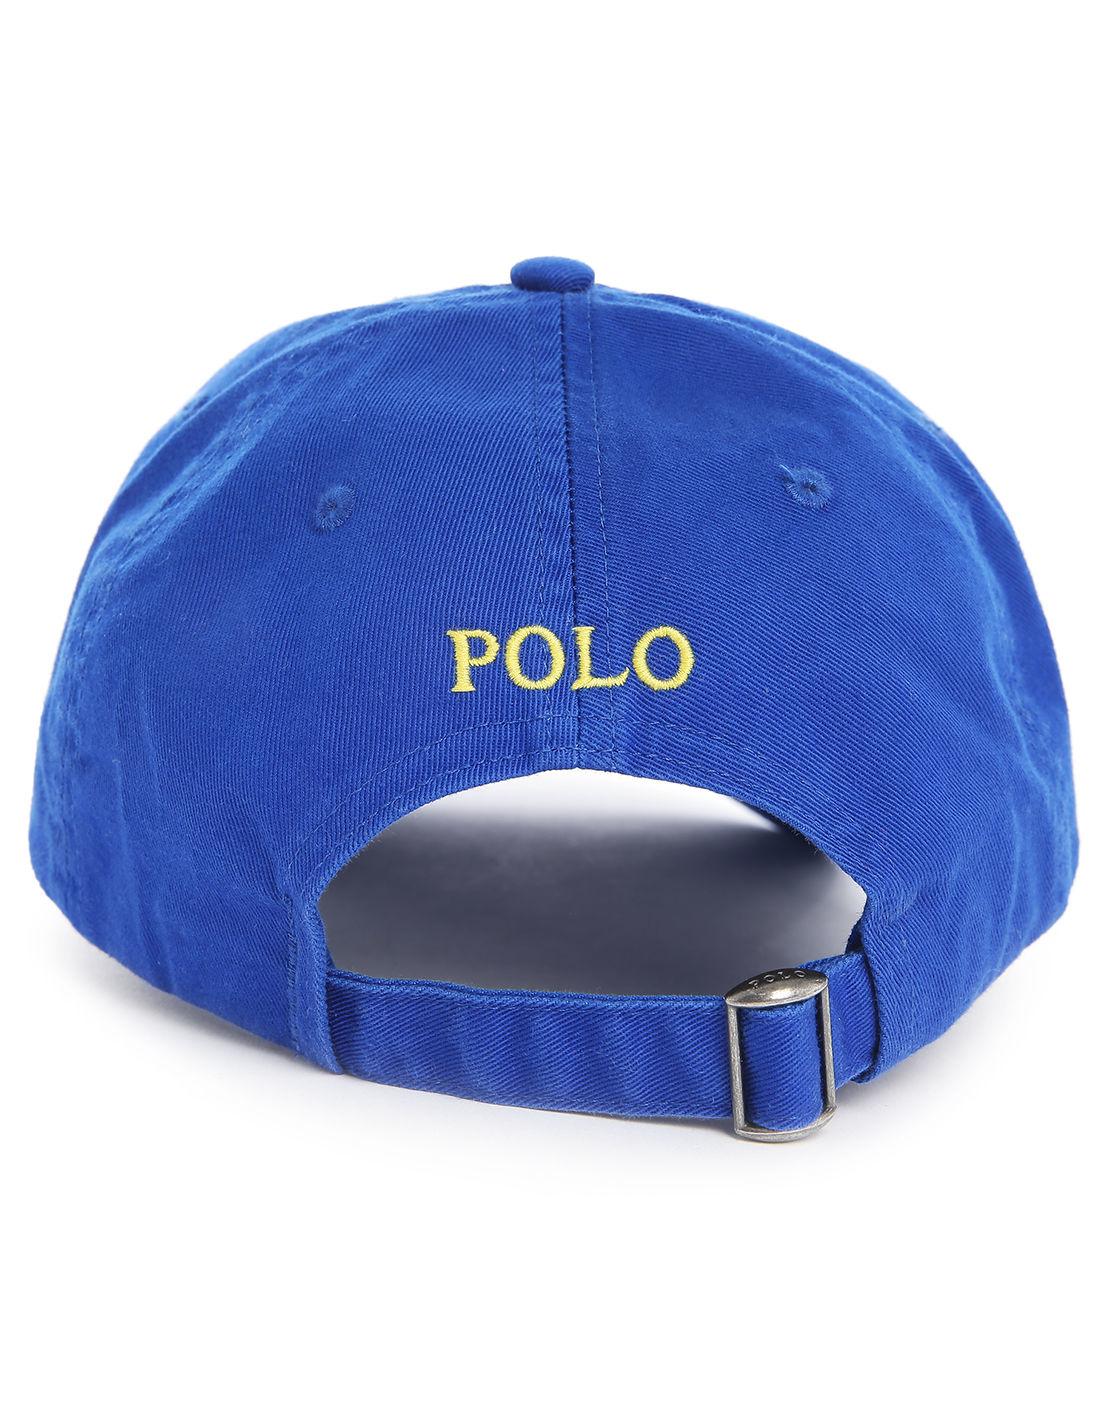 polo ralph lauren blue classic logo cap in blue for men lyst. Black Bedroom Furniture Sets. Home Design Ideas